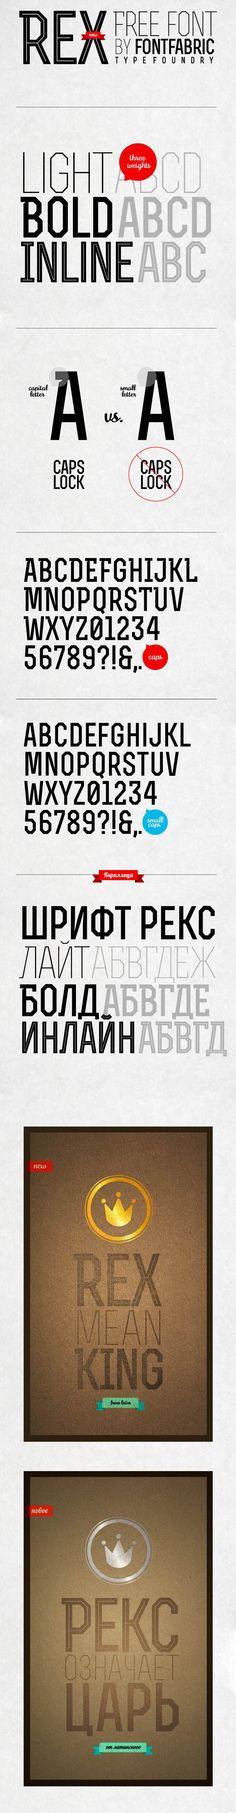 Free Font Download – Rex